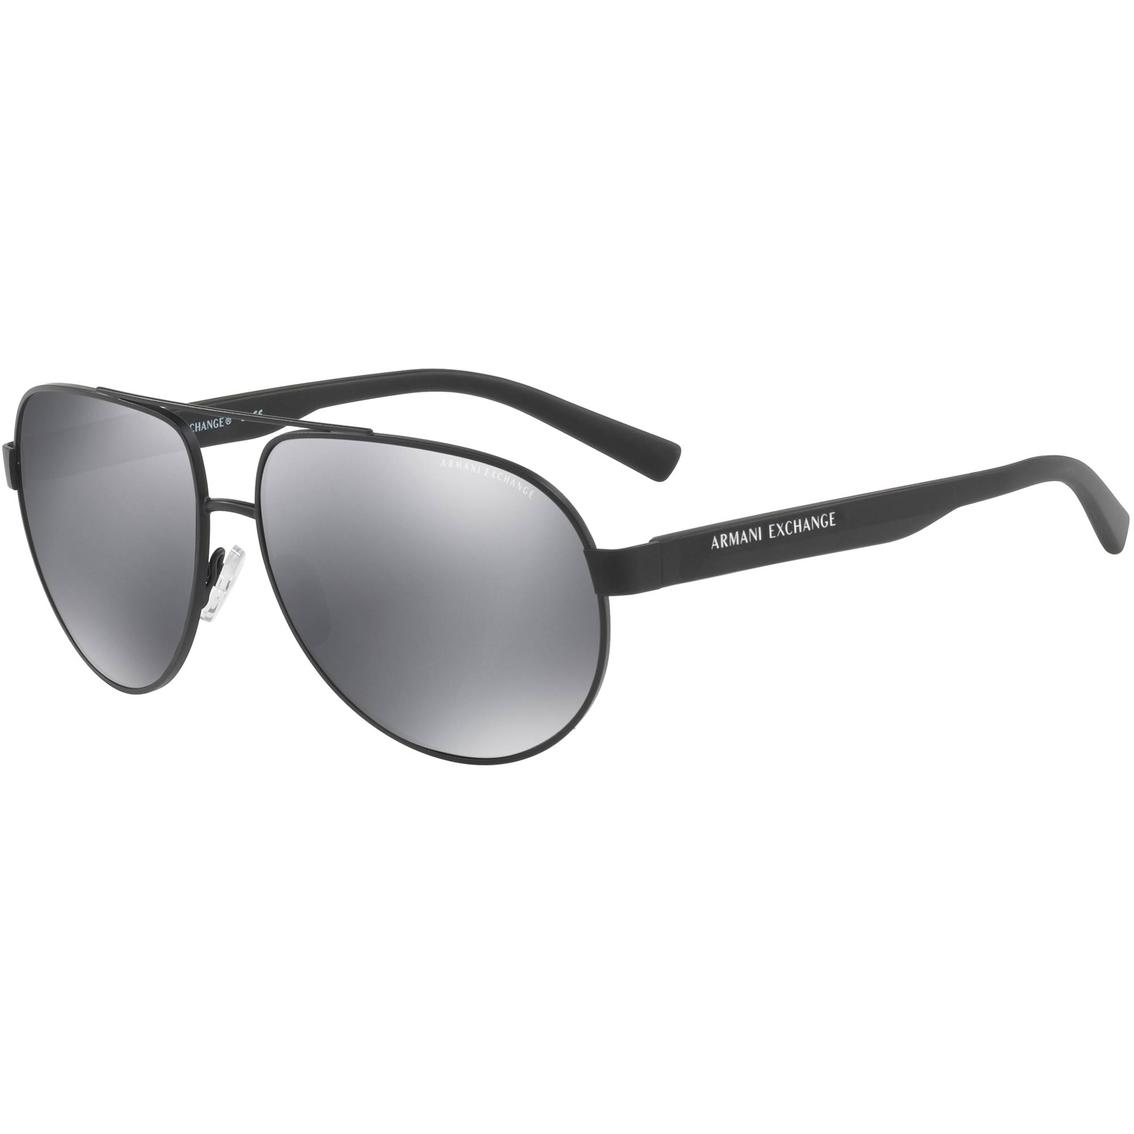 3c65e685b9b85 Armani Exchange Aviator Sunglasses 0ax2022